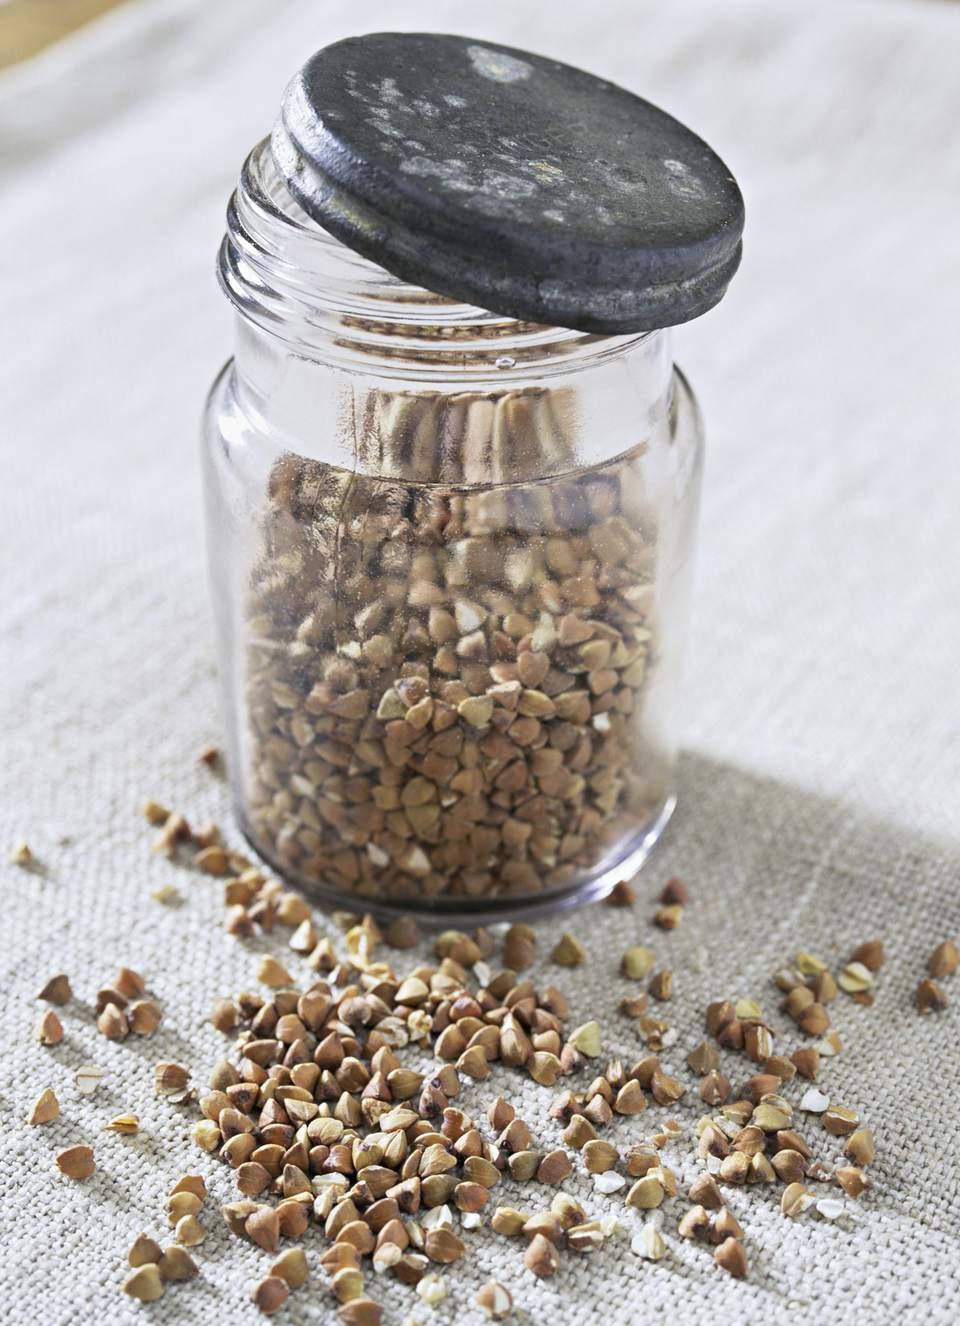 Jar of buckwheat groat